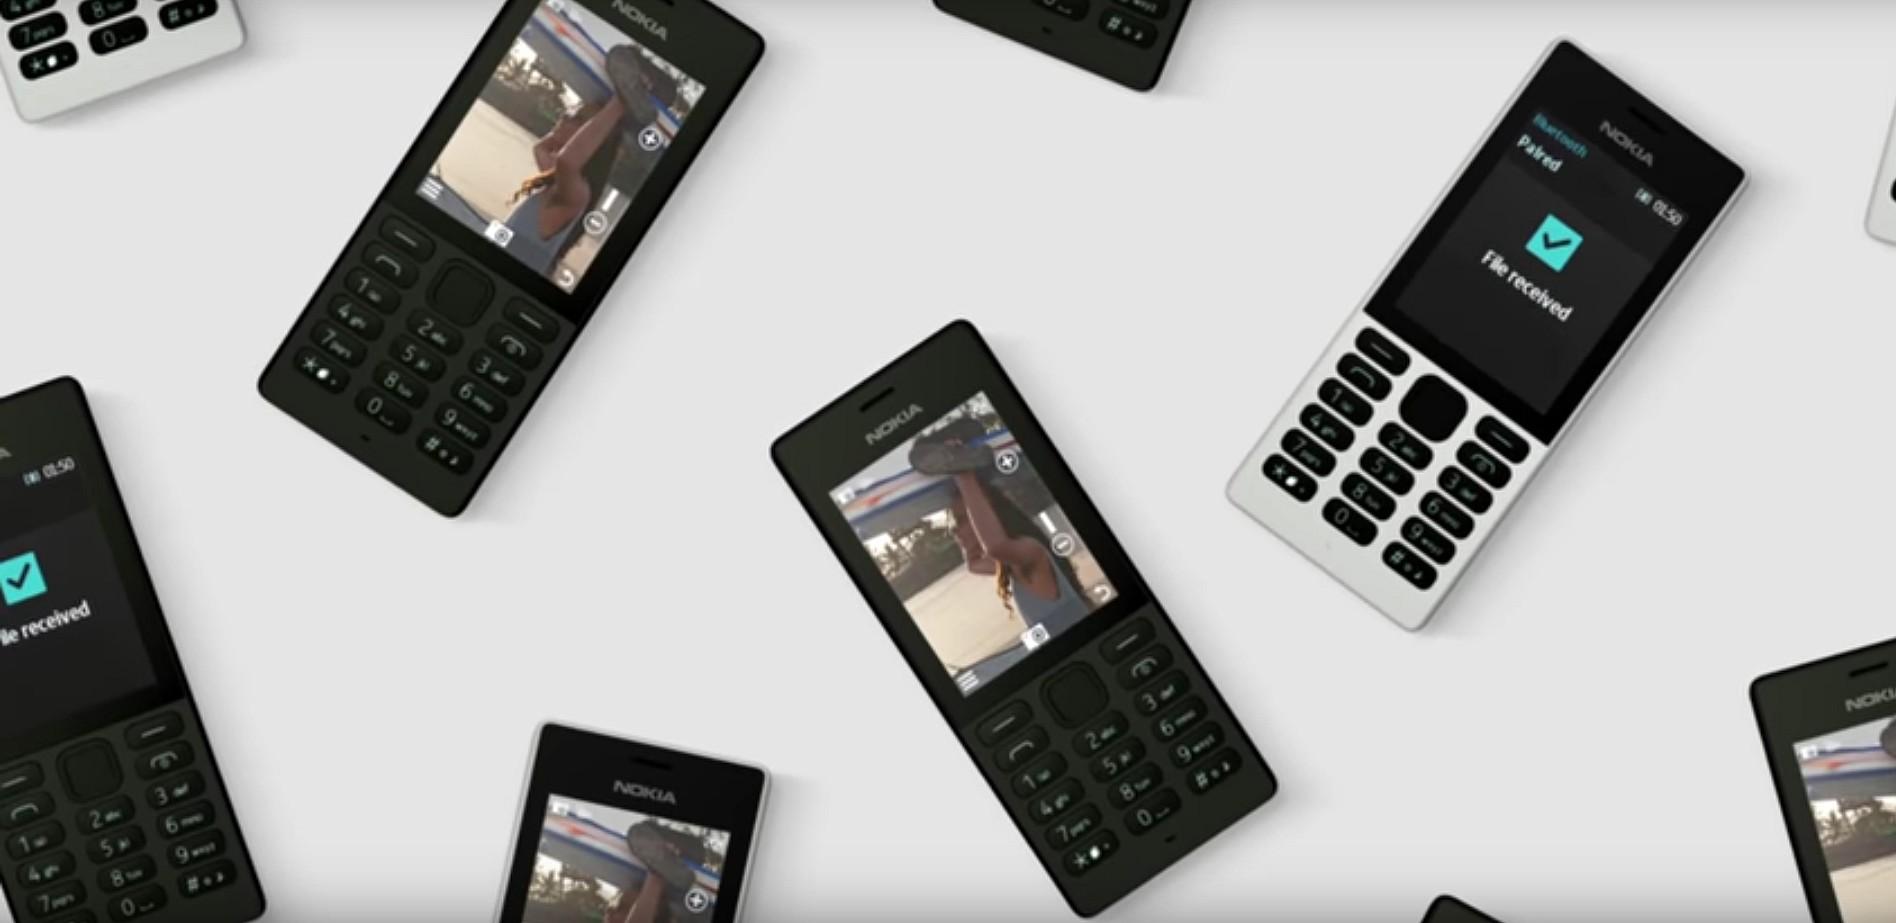 nokia 150 neues feature phone ohne microsoft vorgestellt. Black Bedroom Furniture Sets. Home Design Ideas